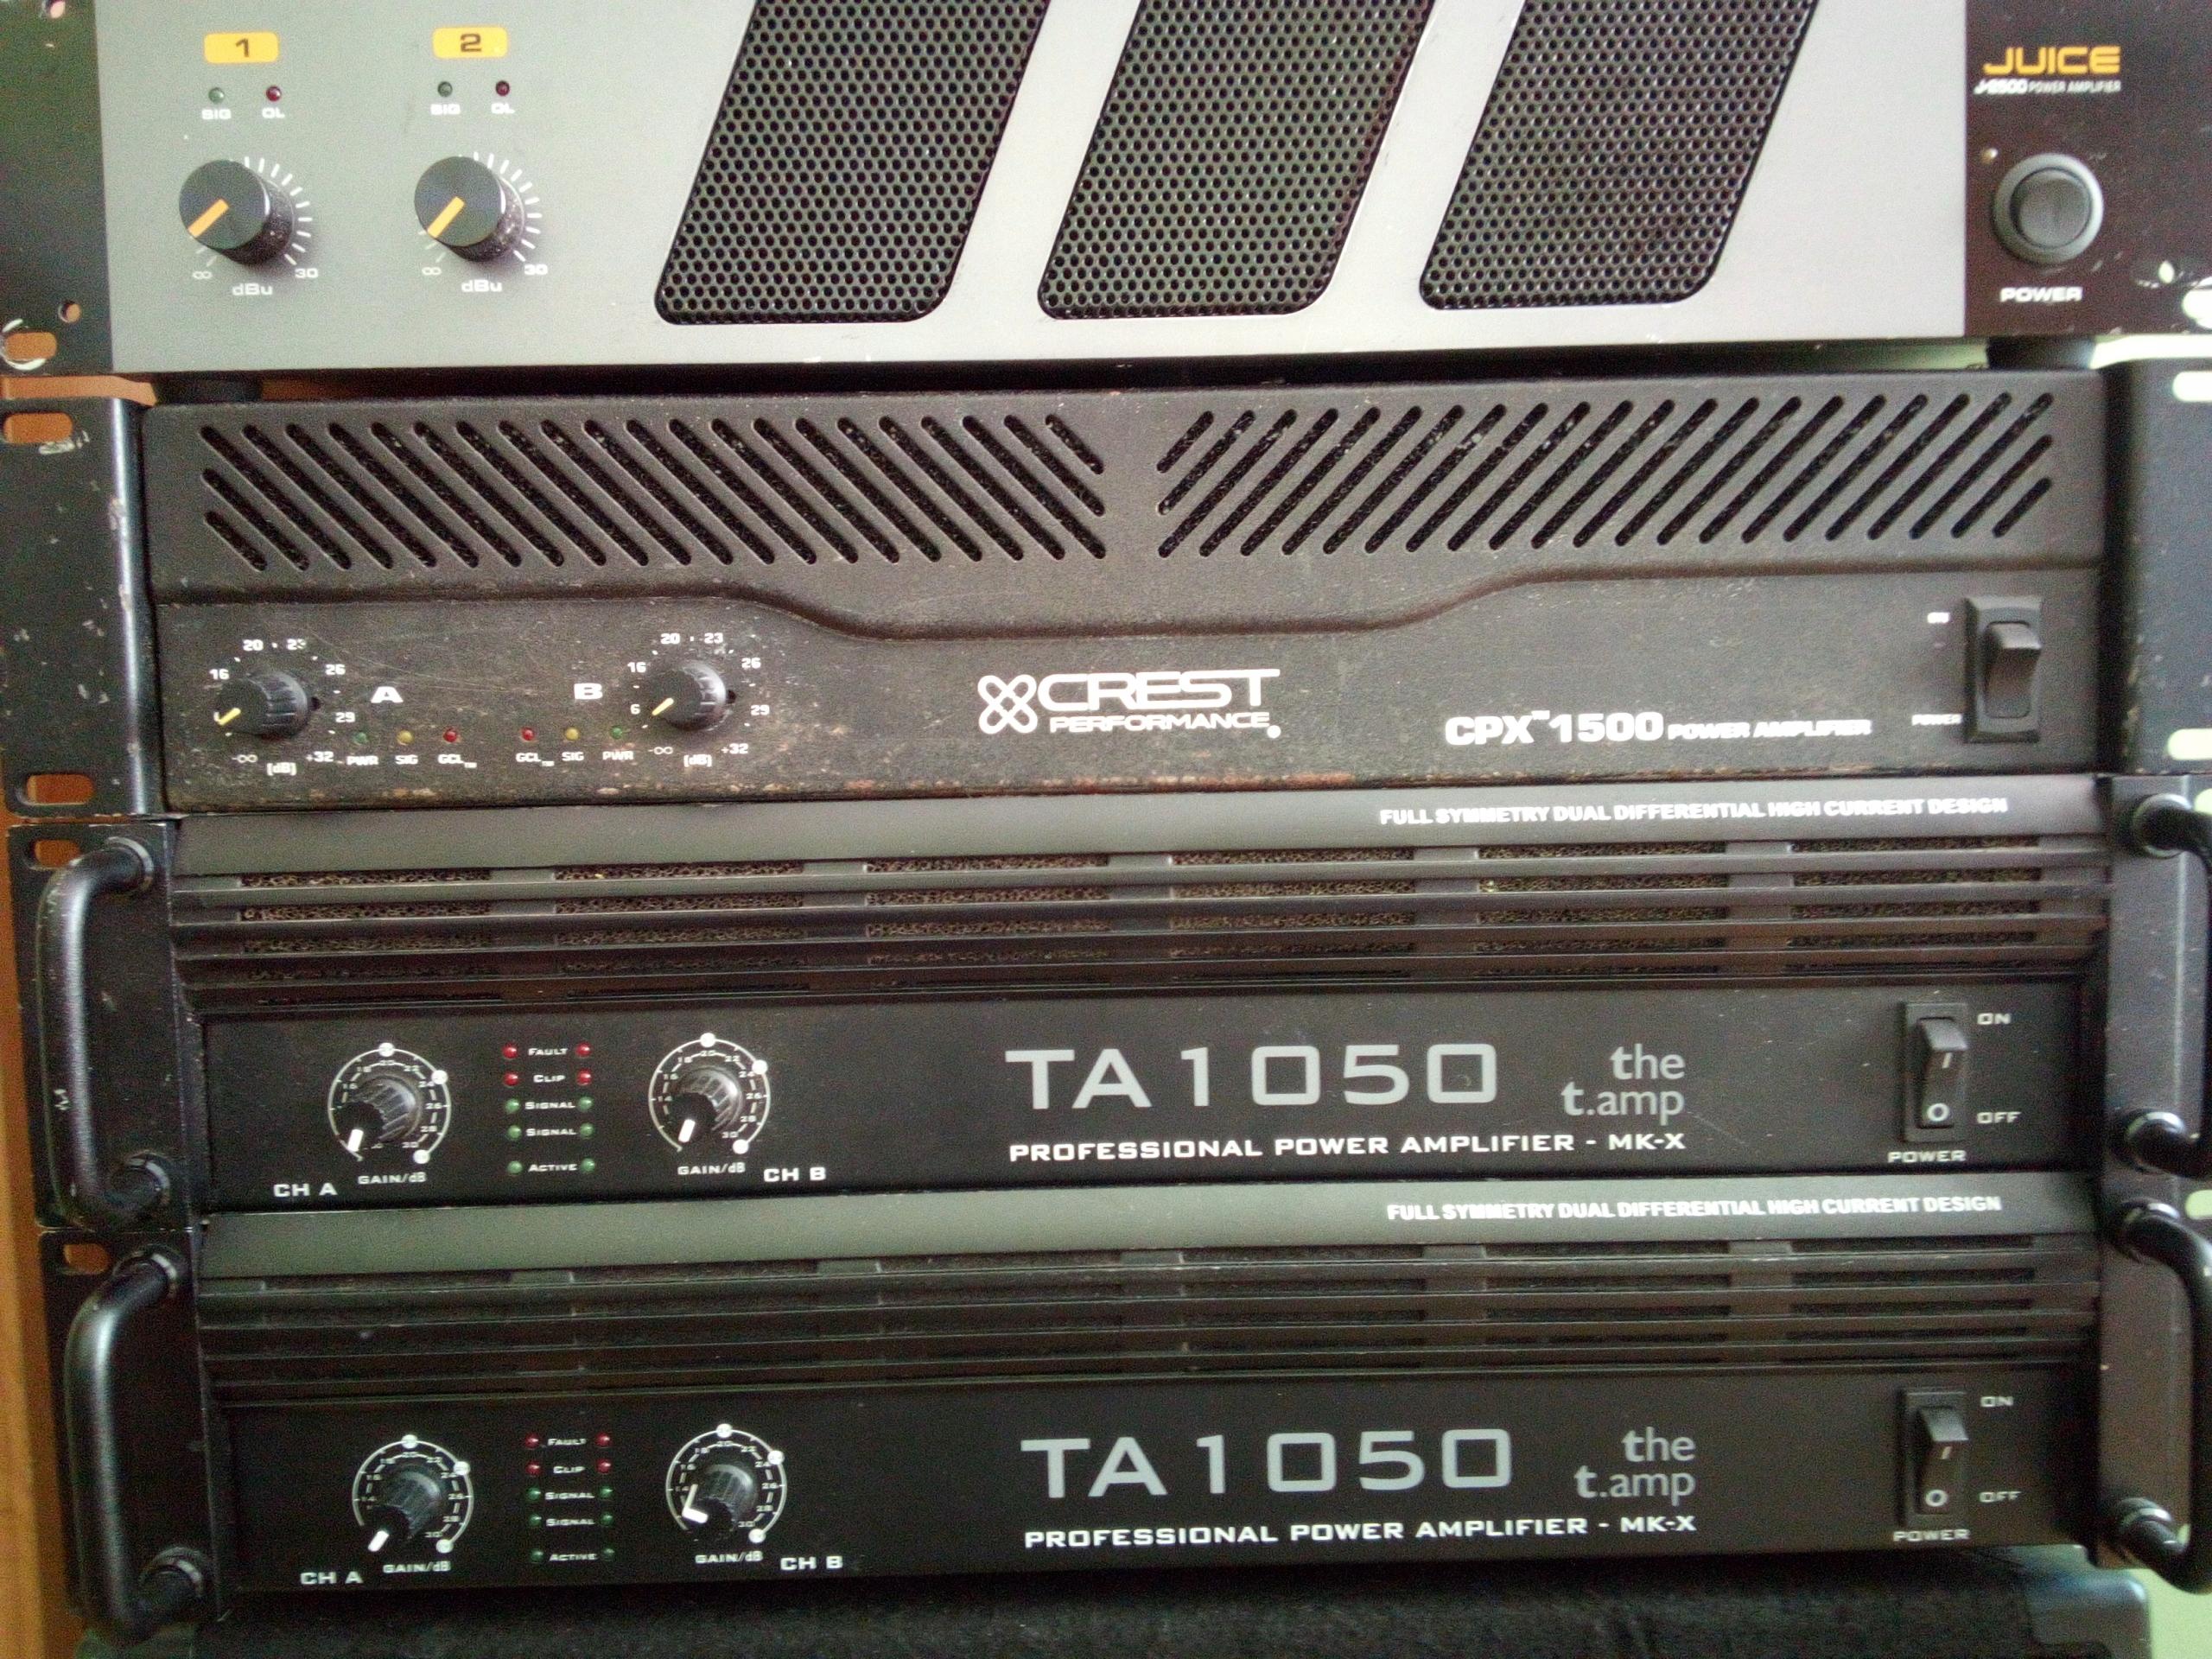 the t.amp TA1050